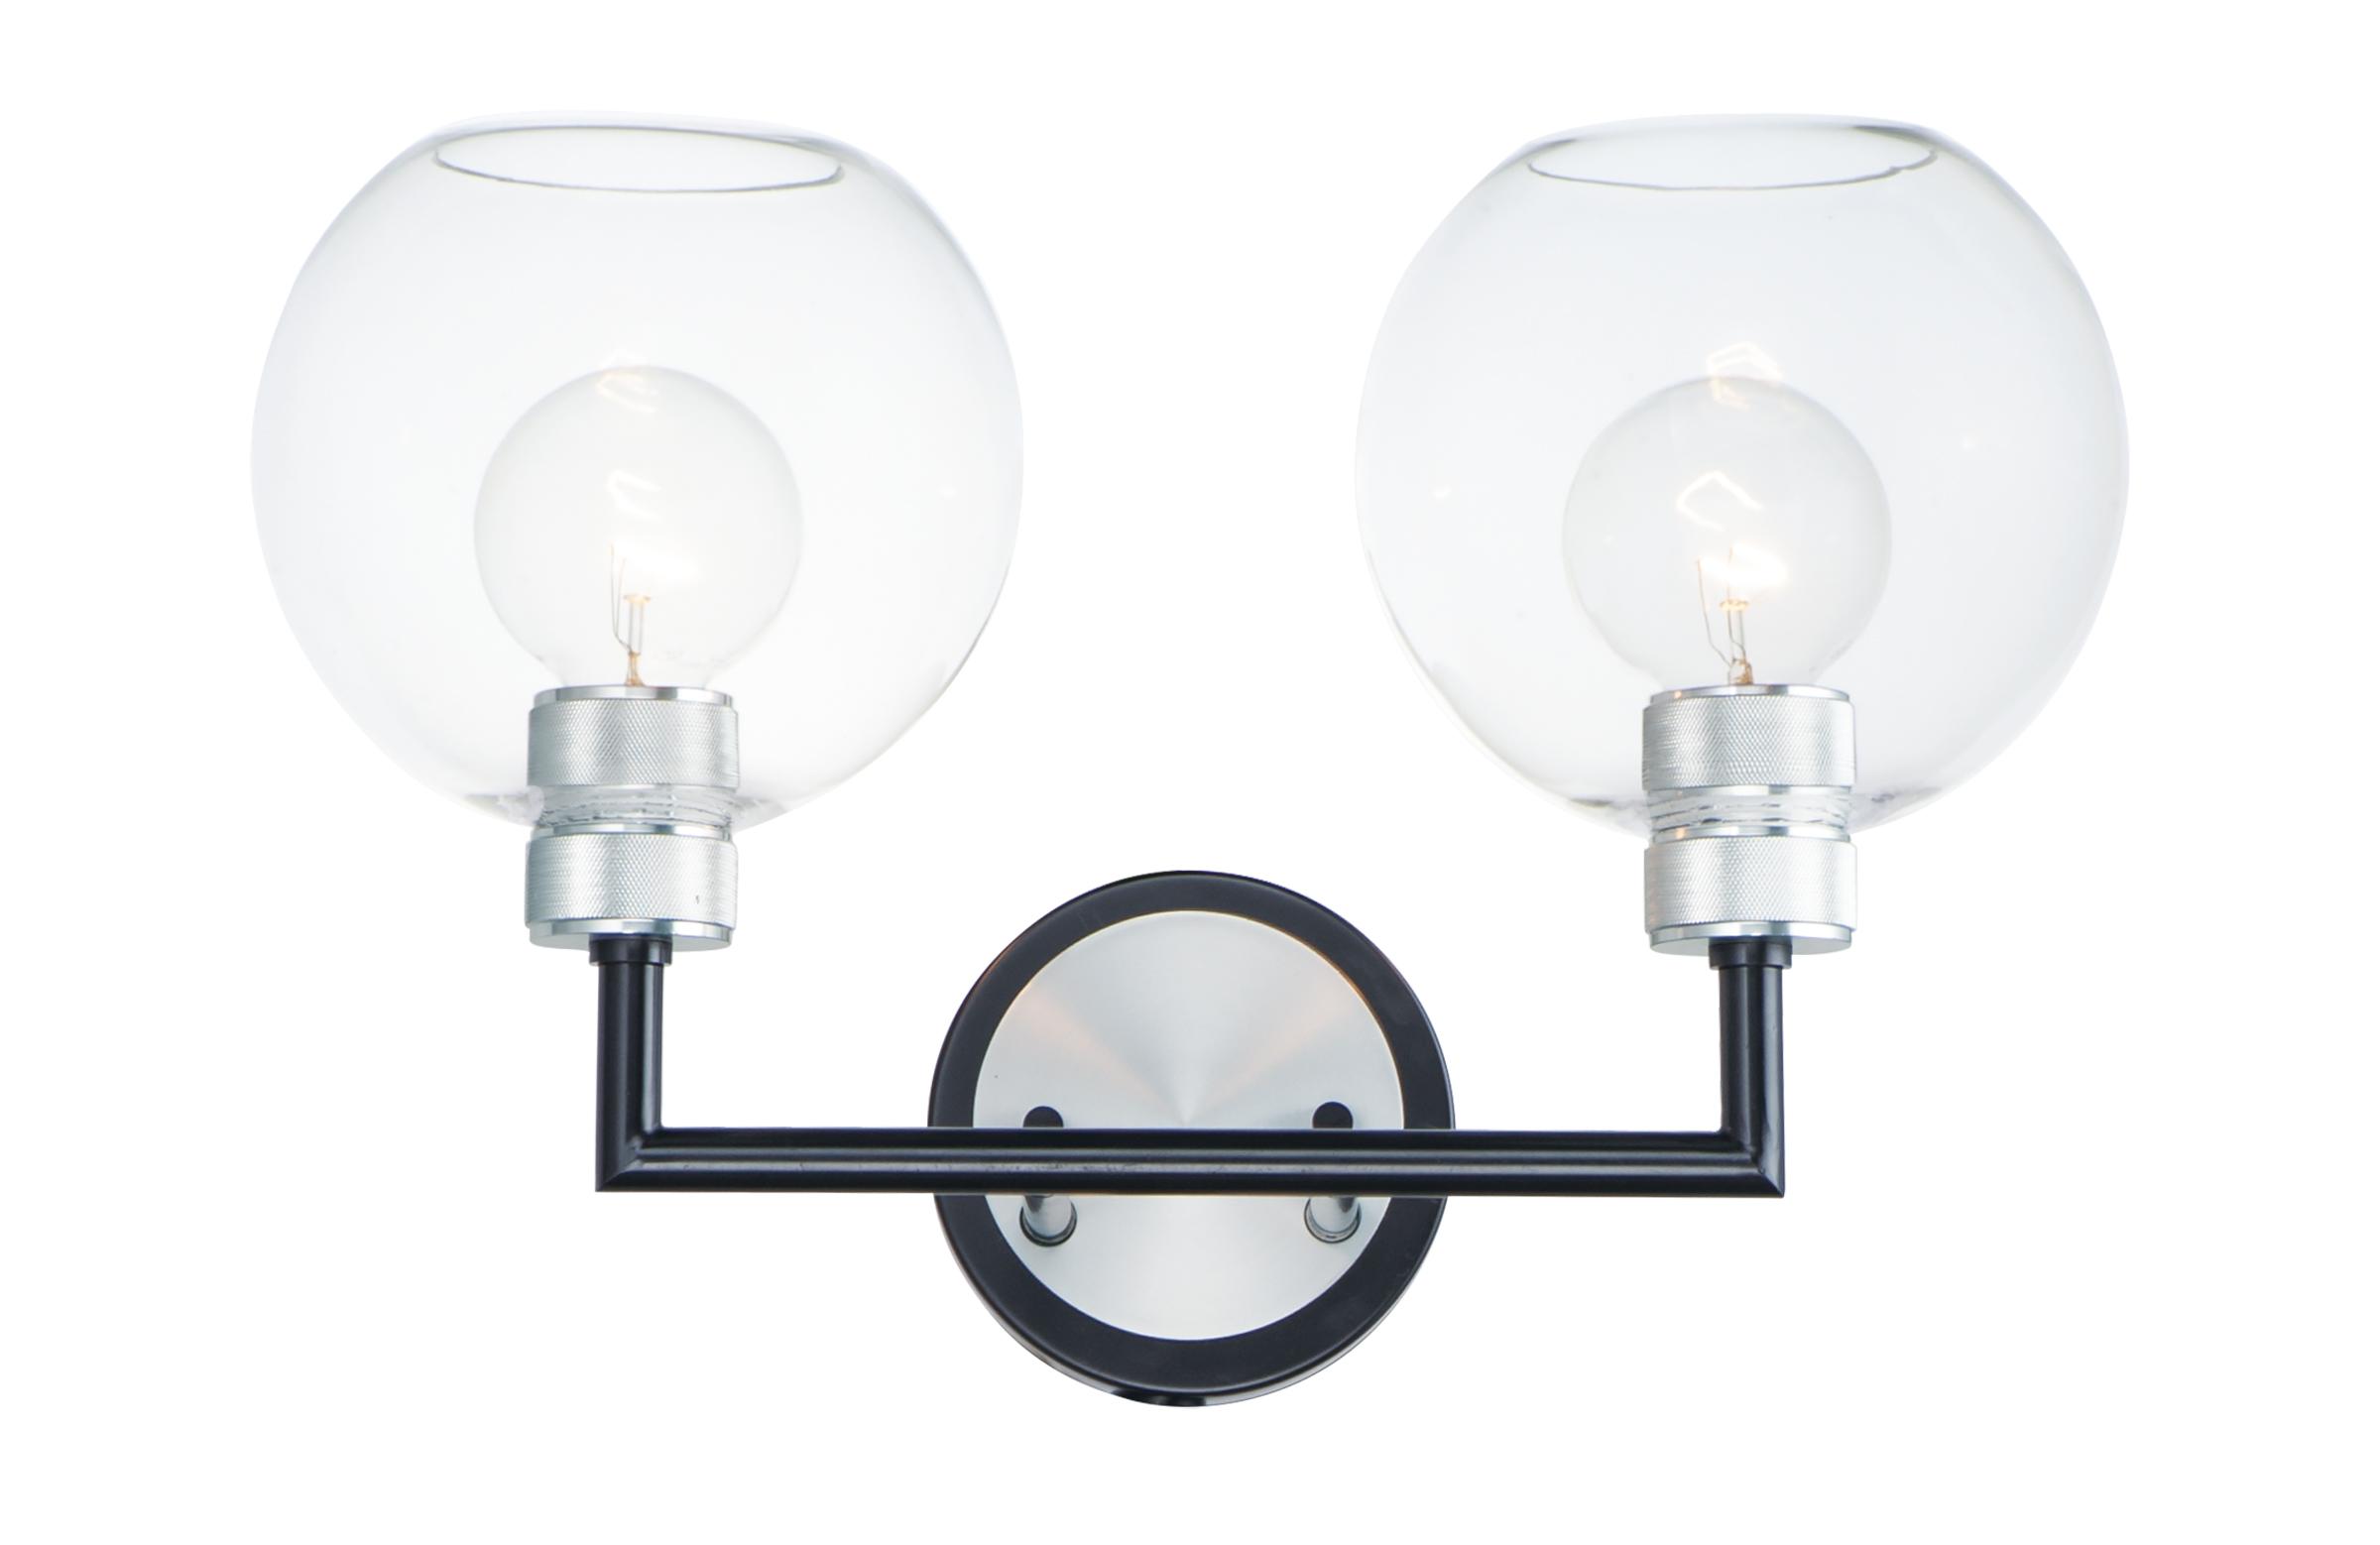 Vessel Wall Sconce | Maxim Lighting